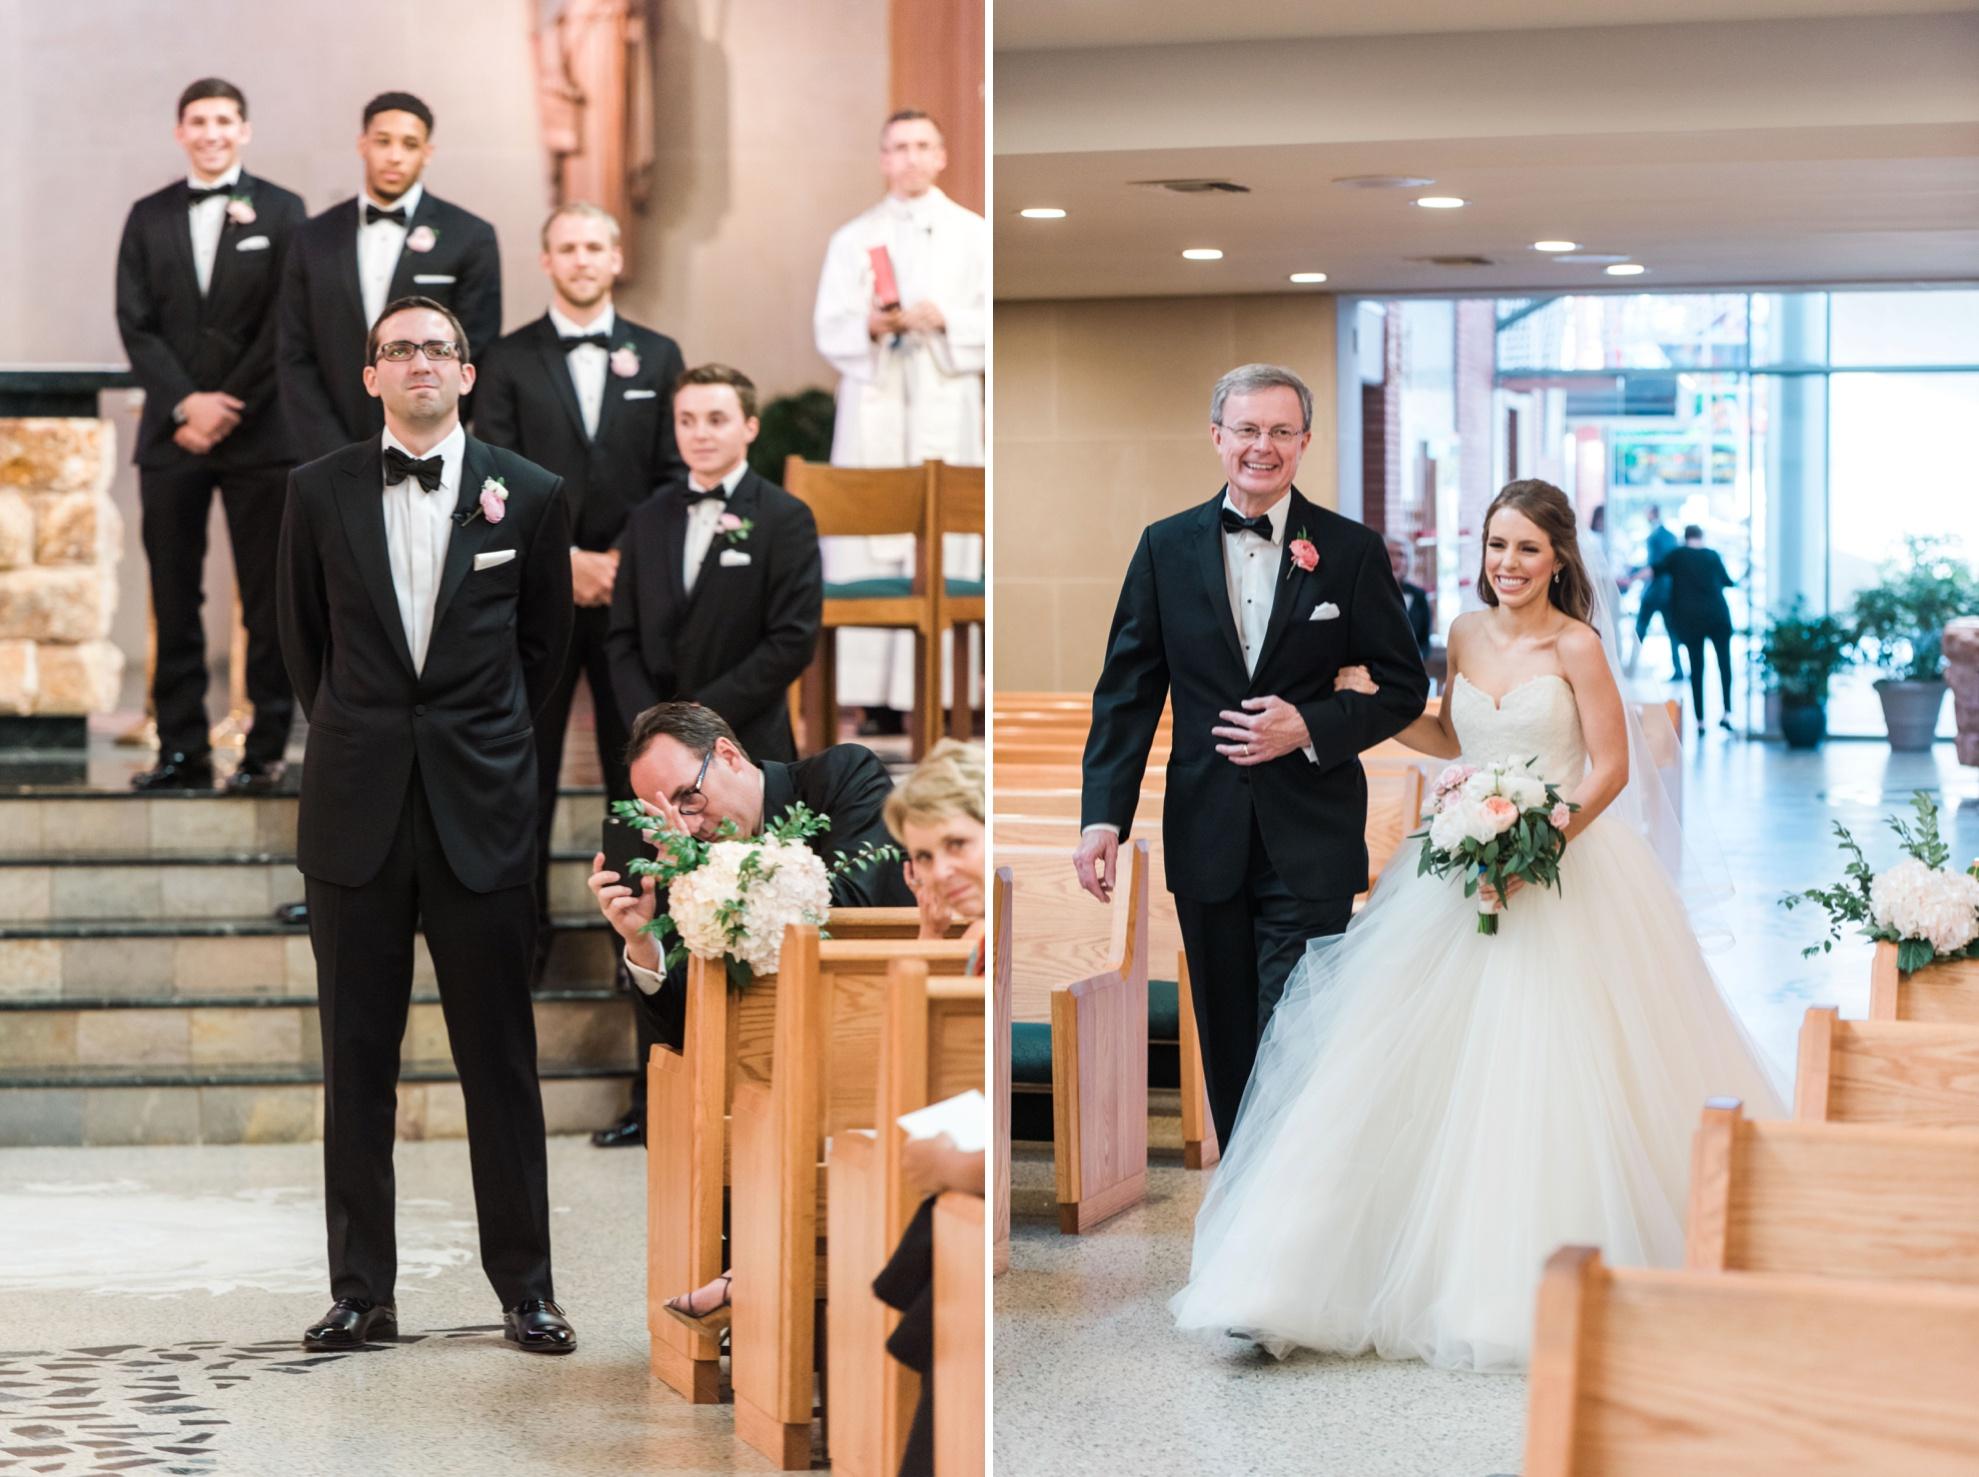 St.-Vincent-De-Paul-Catholic-Church-Wedding-Ceremony-Photographer-Dana-Fernandez-Photography-3.jpg